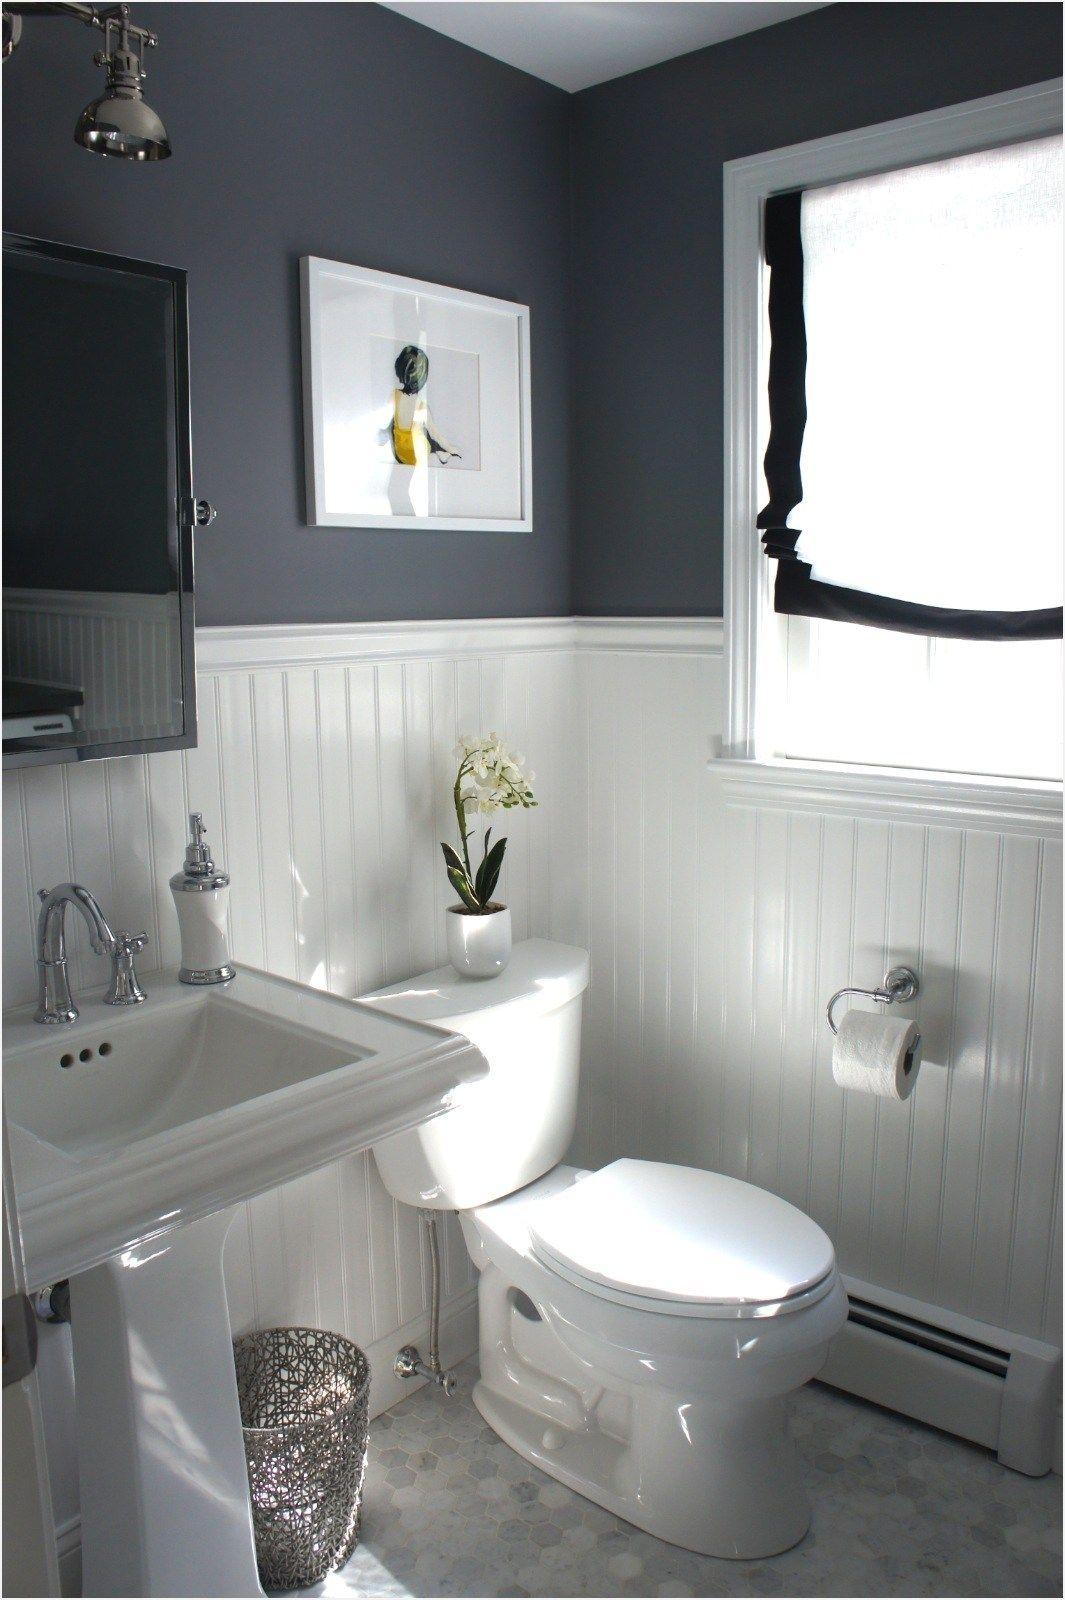 coastal half bath remodel ideas homenthusiastic on bathroom renovation ideas modern id=33162